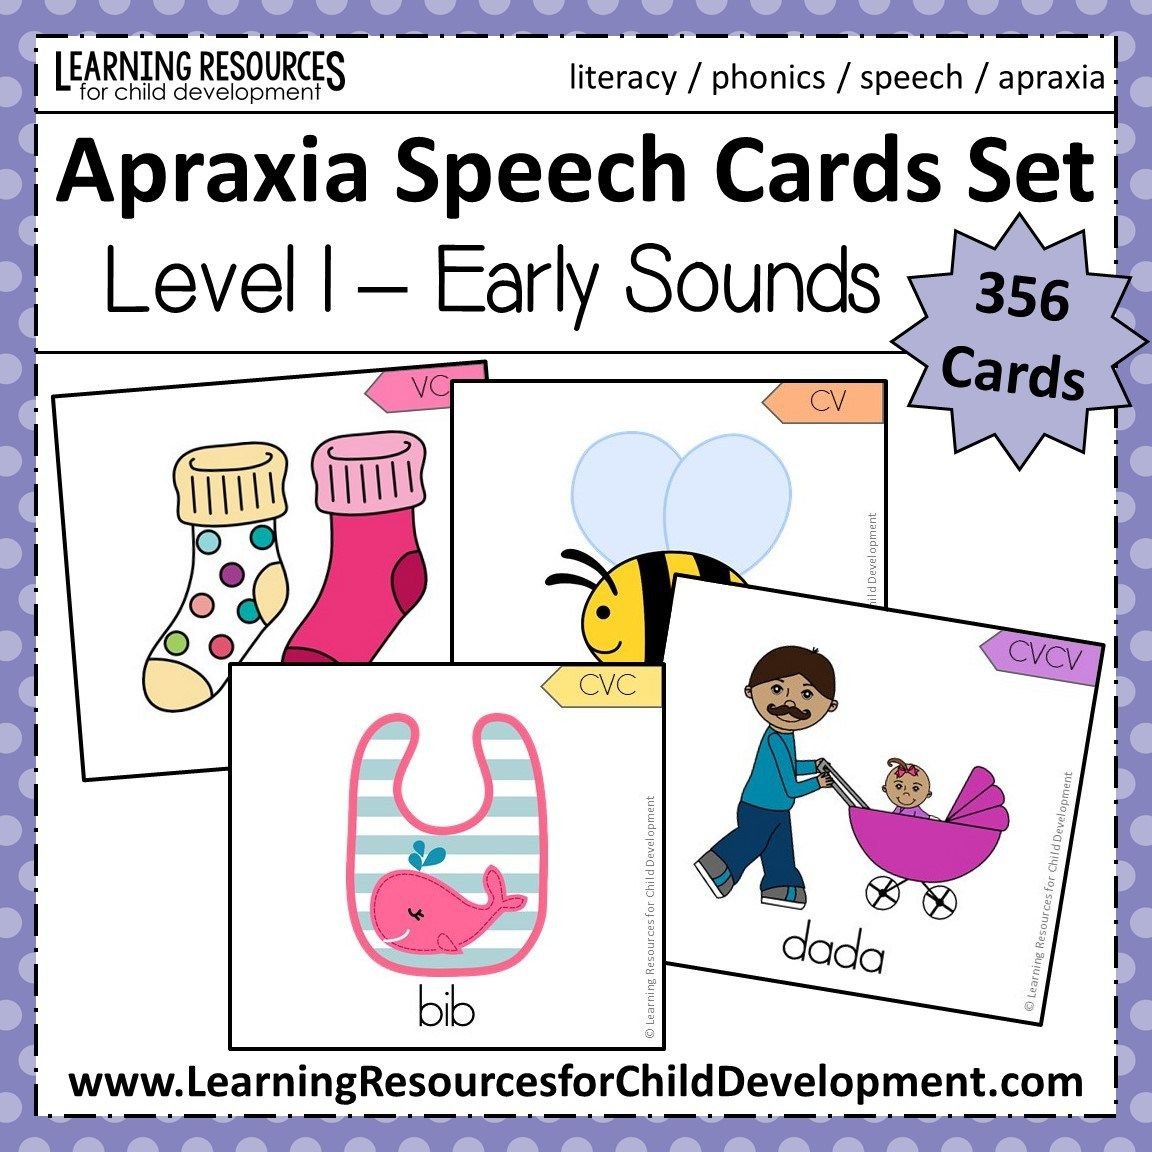 Apraxia Speech Cards Set Level 1